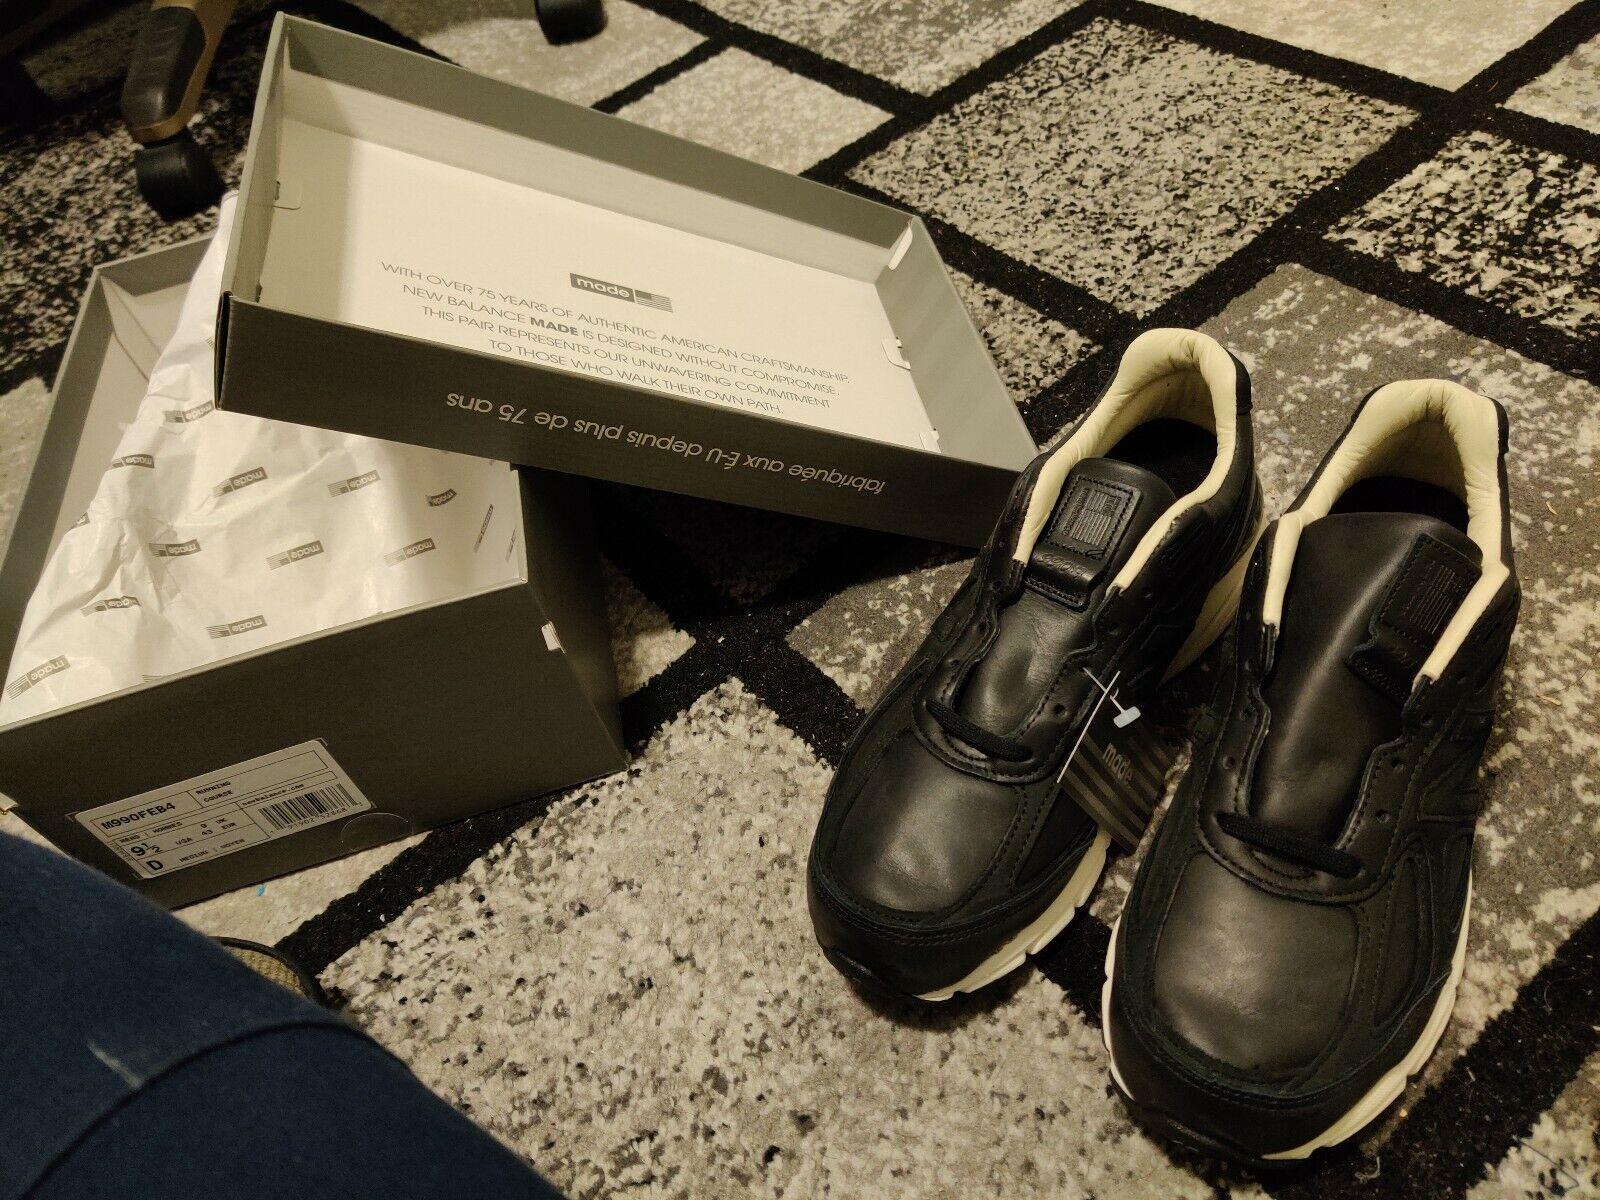 Zapato de correr Mens New Cuero Negro M990v4 Balance Nuevo en Caja M990FEB4